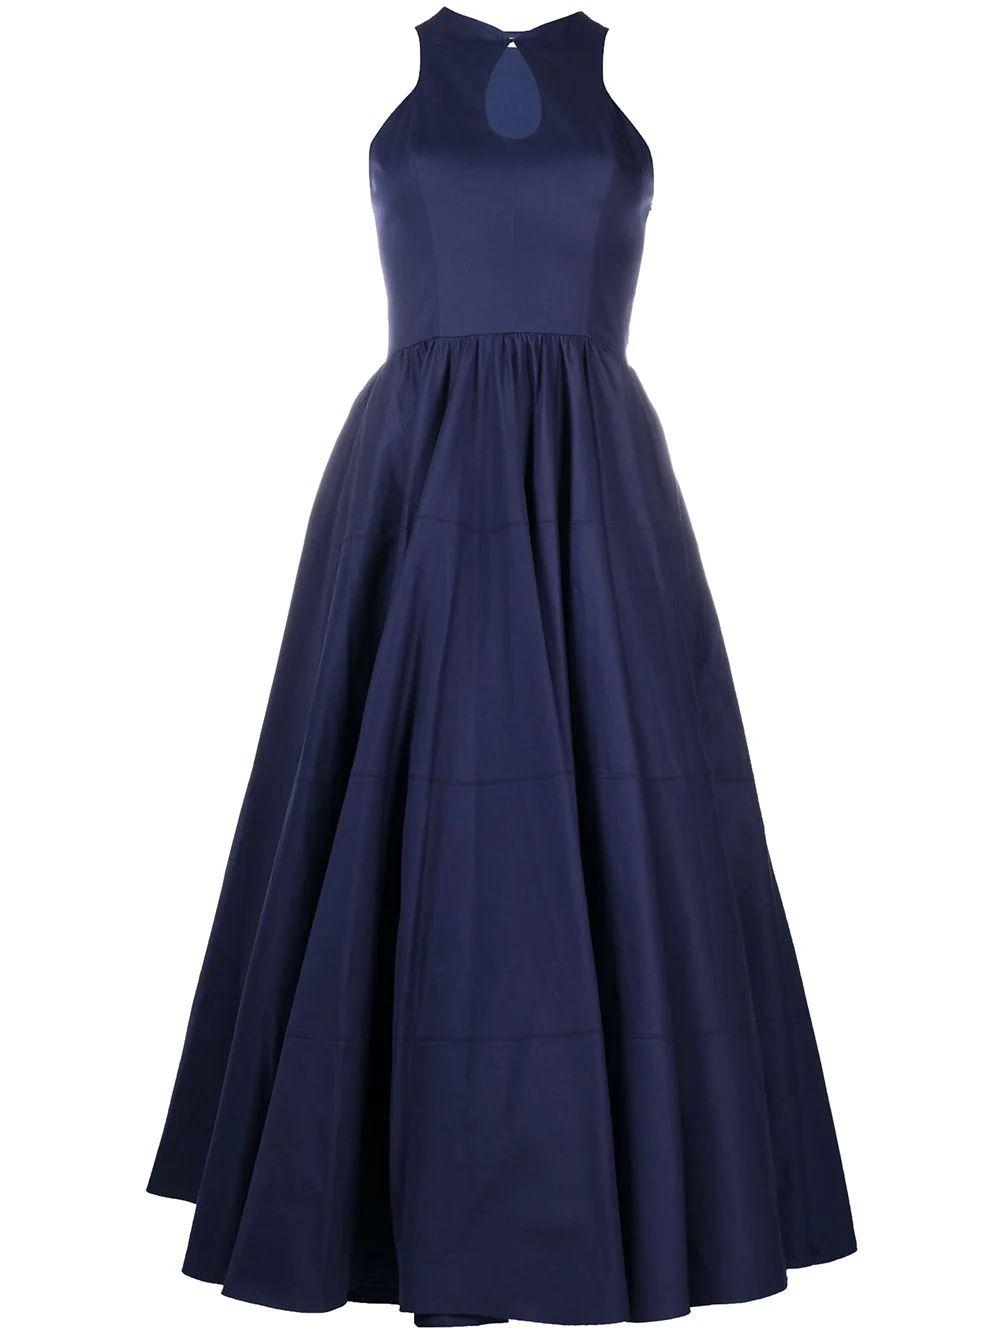 Sleeveless Keyhole Midi Dress With Full Skirt Item # AS9RK38LT235